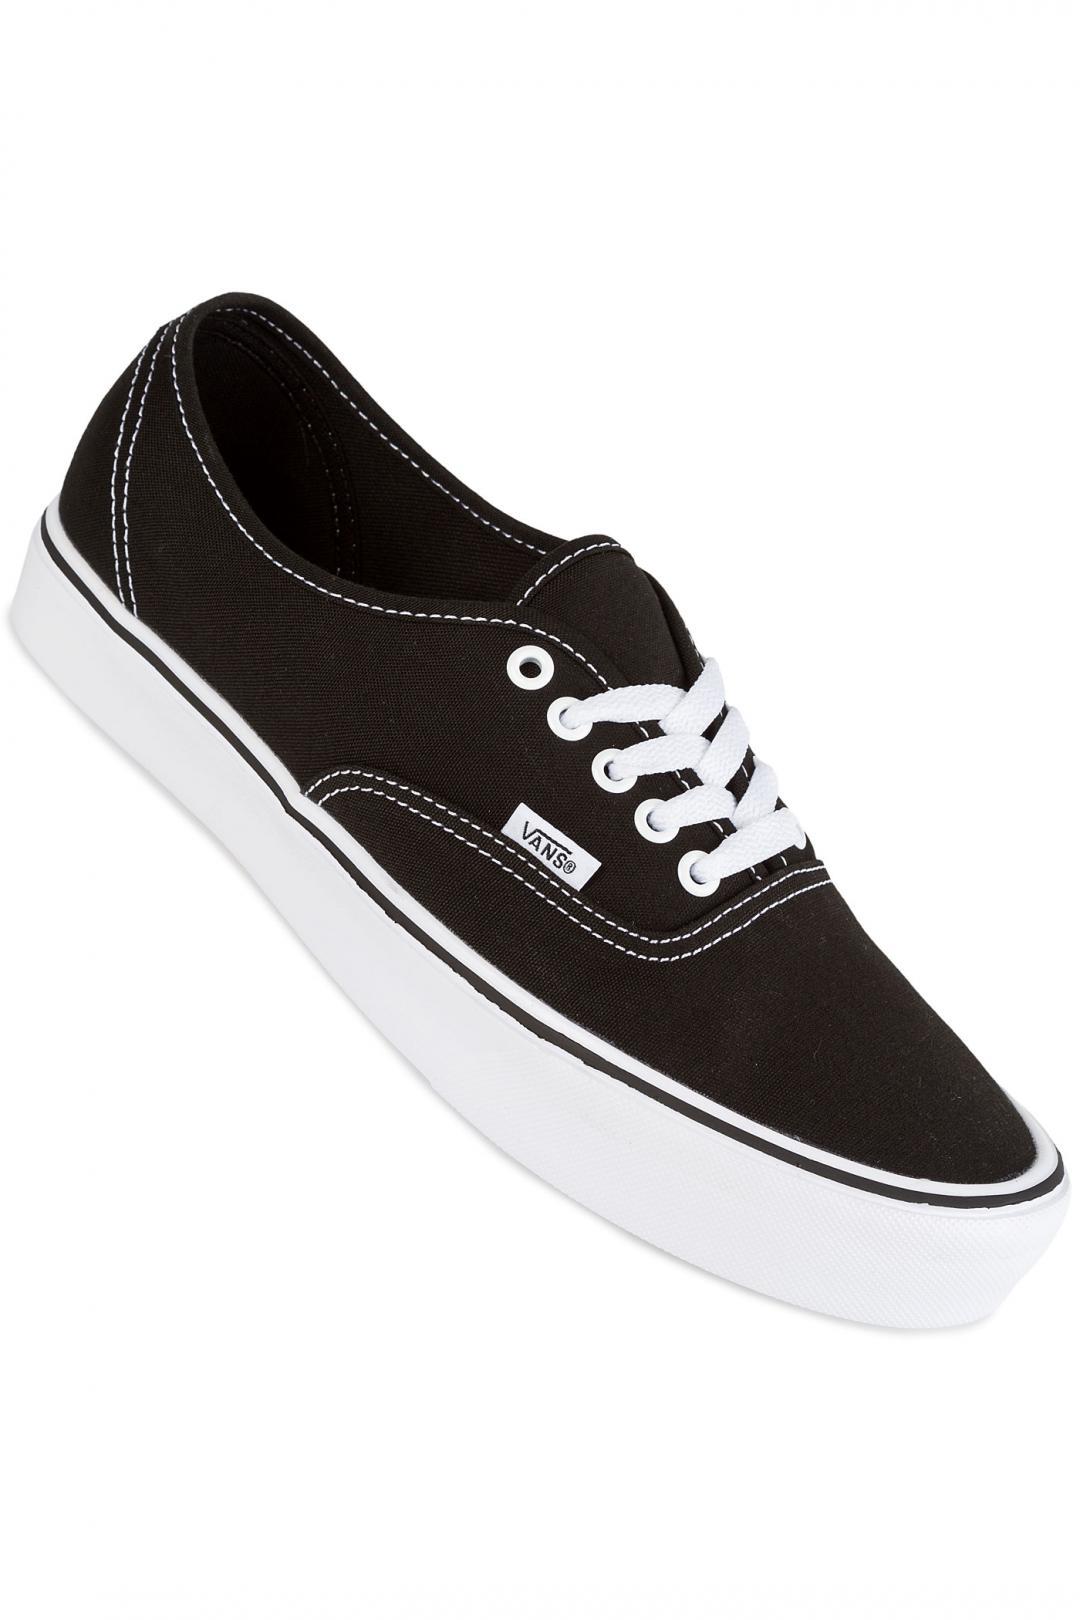 Uomo Vans Authentic Lite Canvas black white | Sneaker